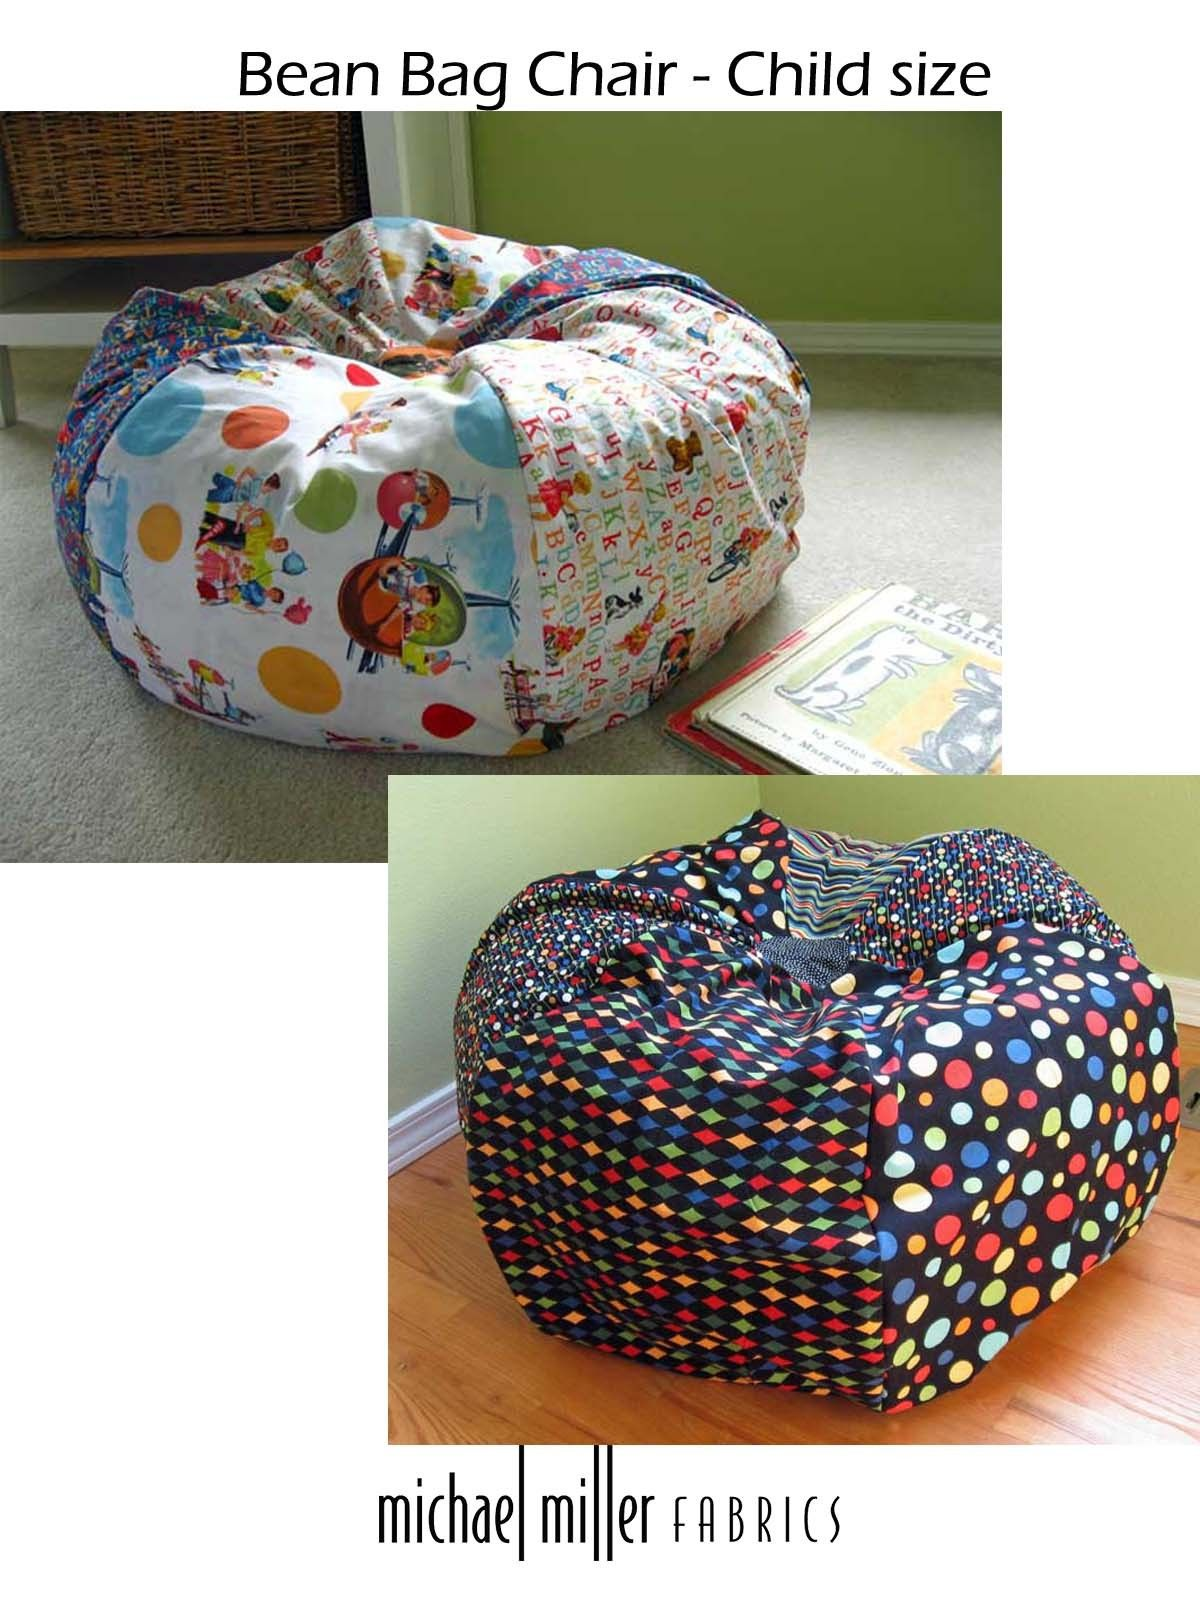 Bean Bag Chair  Child size tutorial  Free patterns